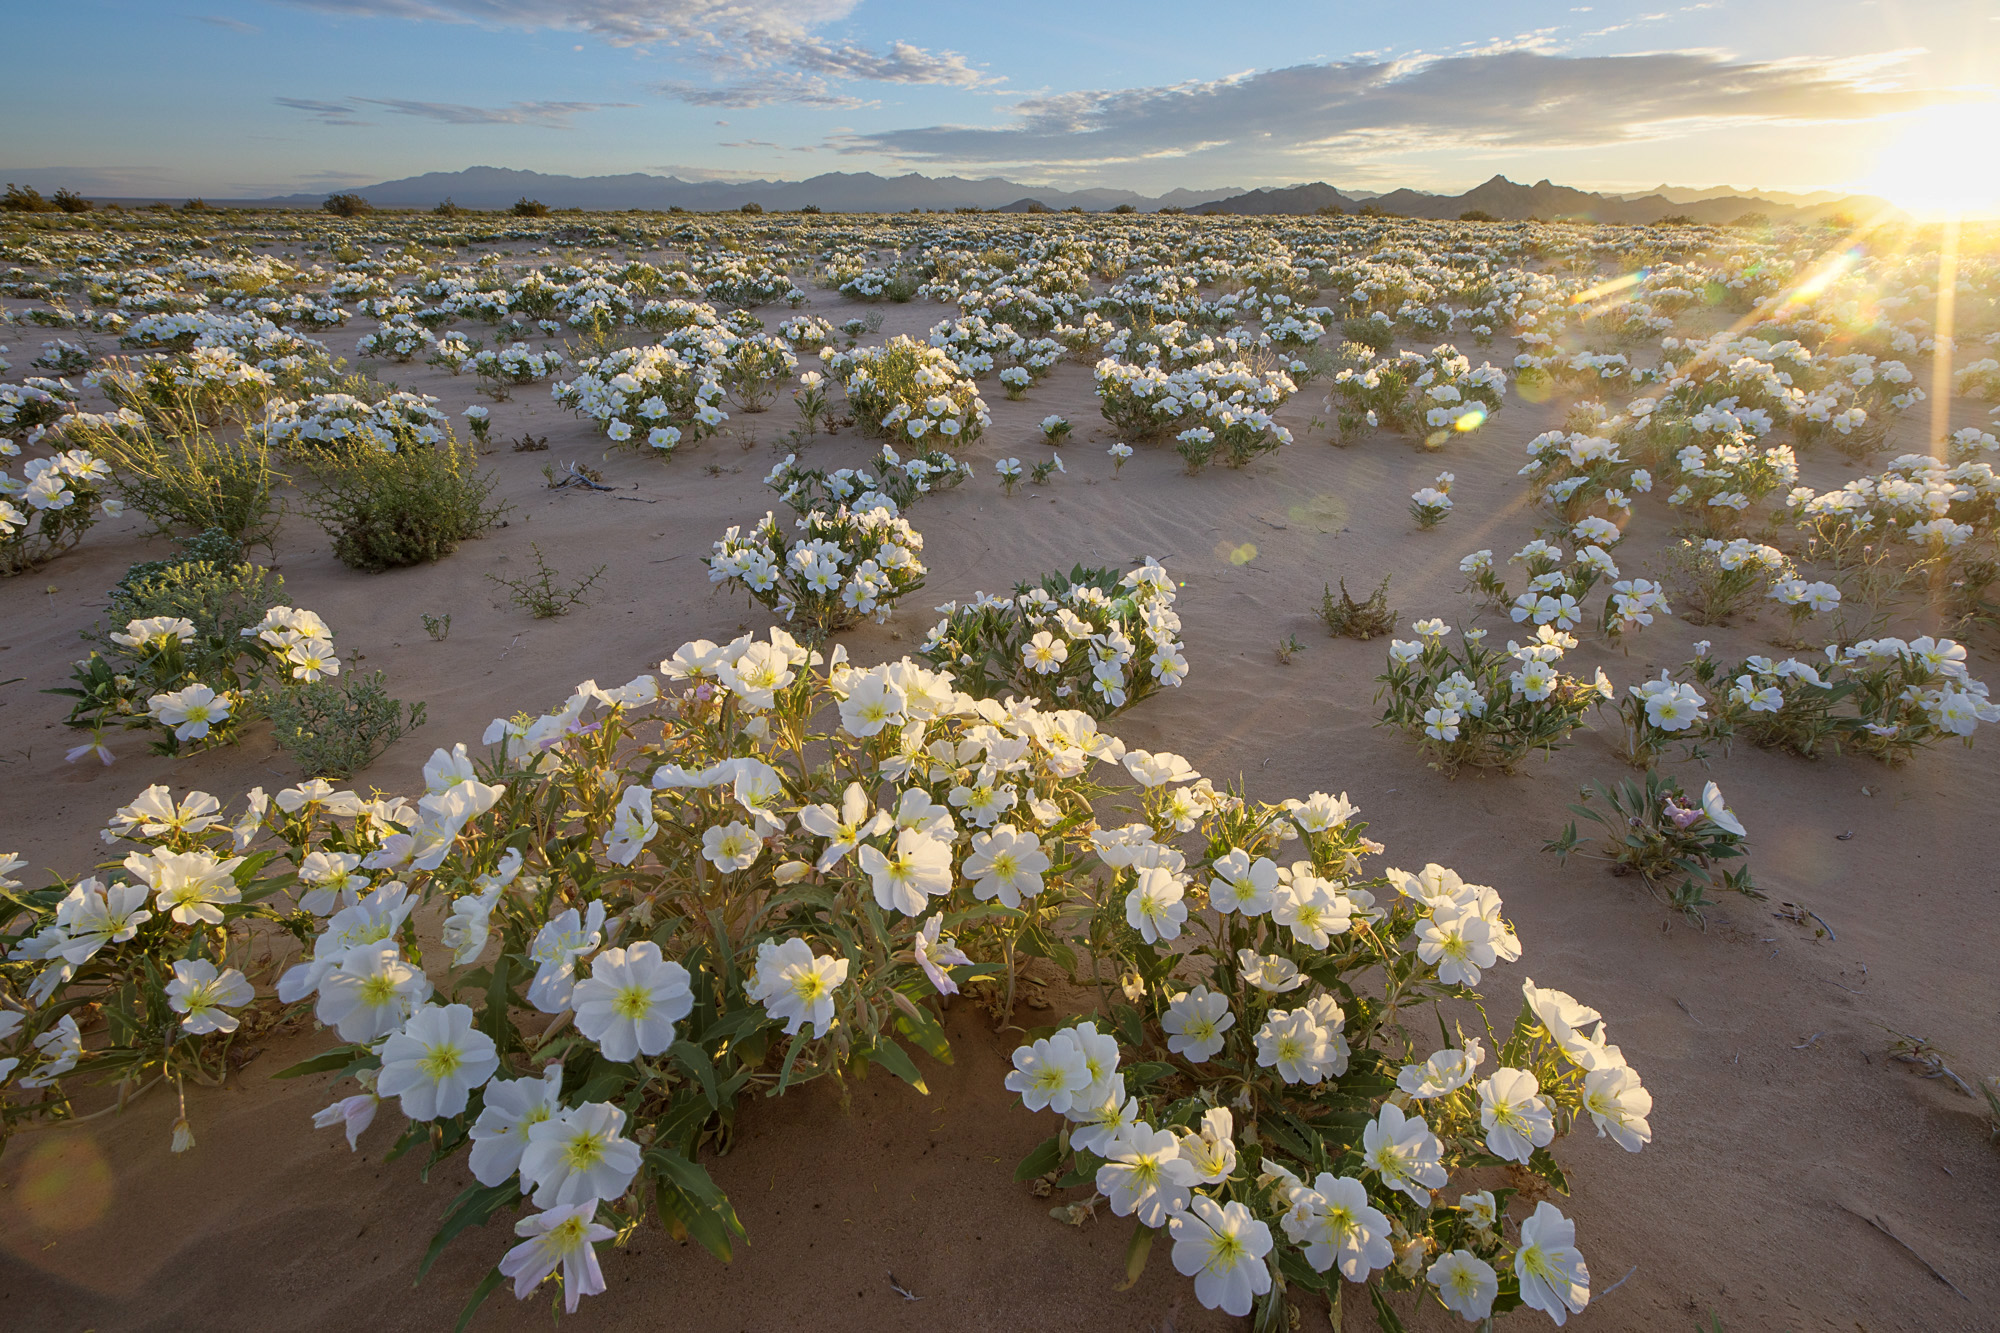 https://www.goodfreephotos.com/united-states/california/other/white-flowers-in-the-desert-in-the-cadiz-wilderness.jpg.php